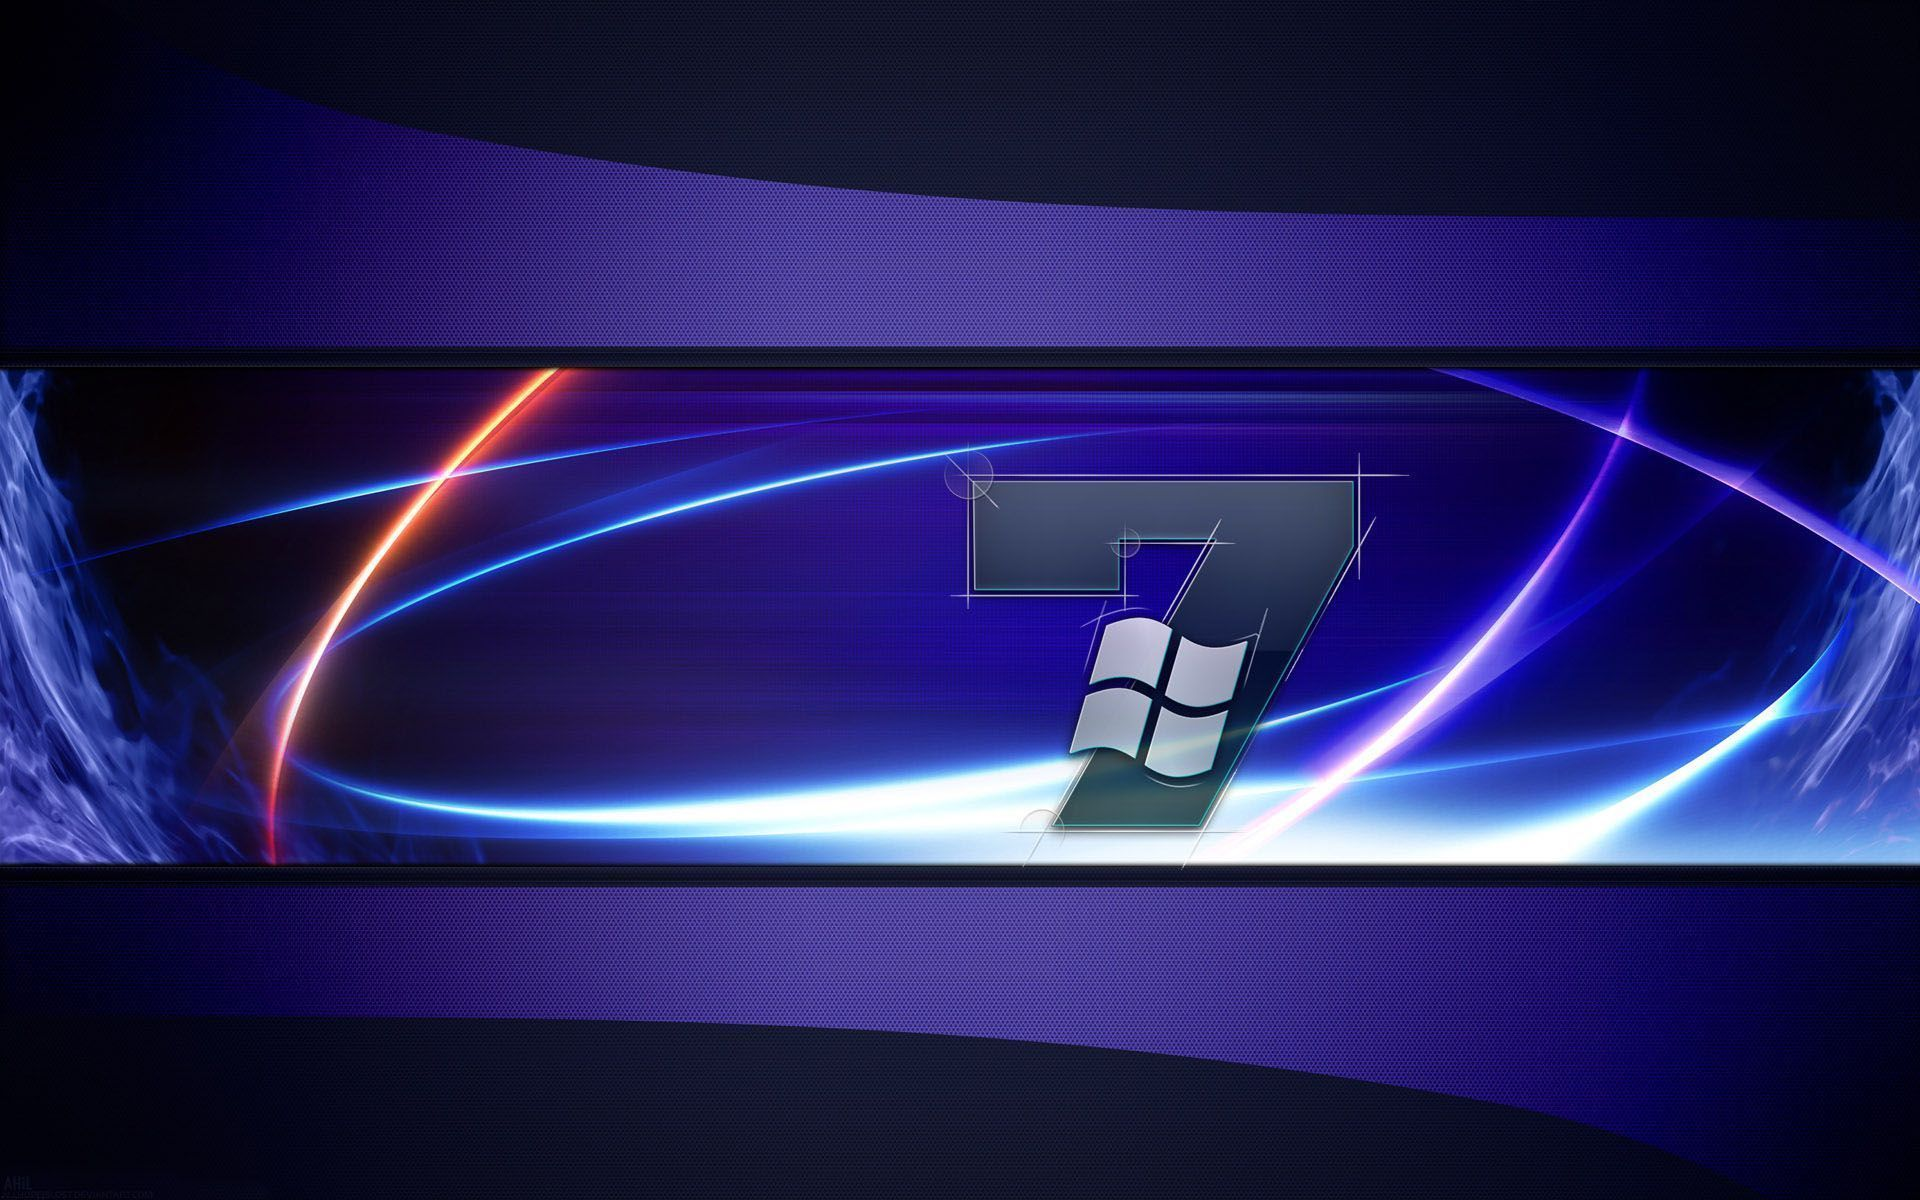 windows 7 ultimate wallpaper widescreen-4 - press magazine